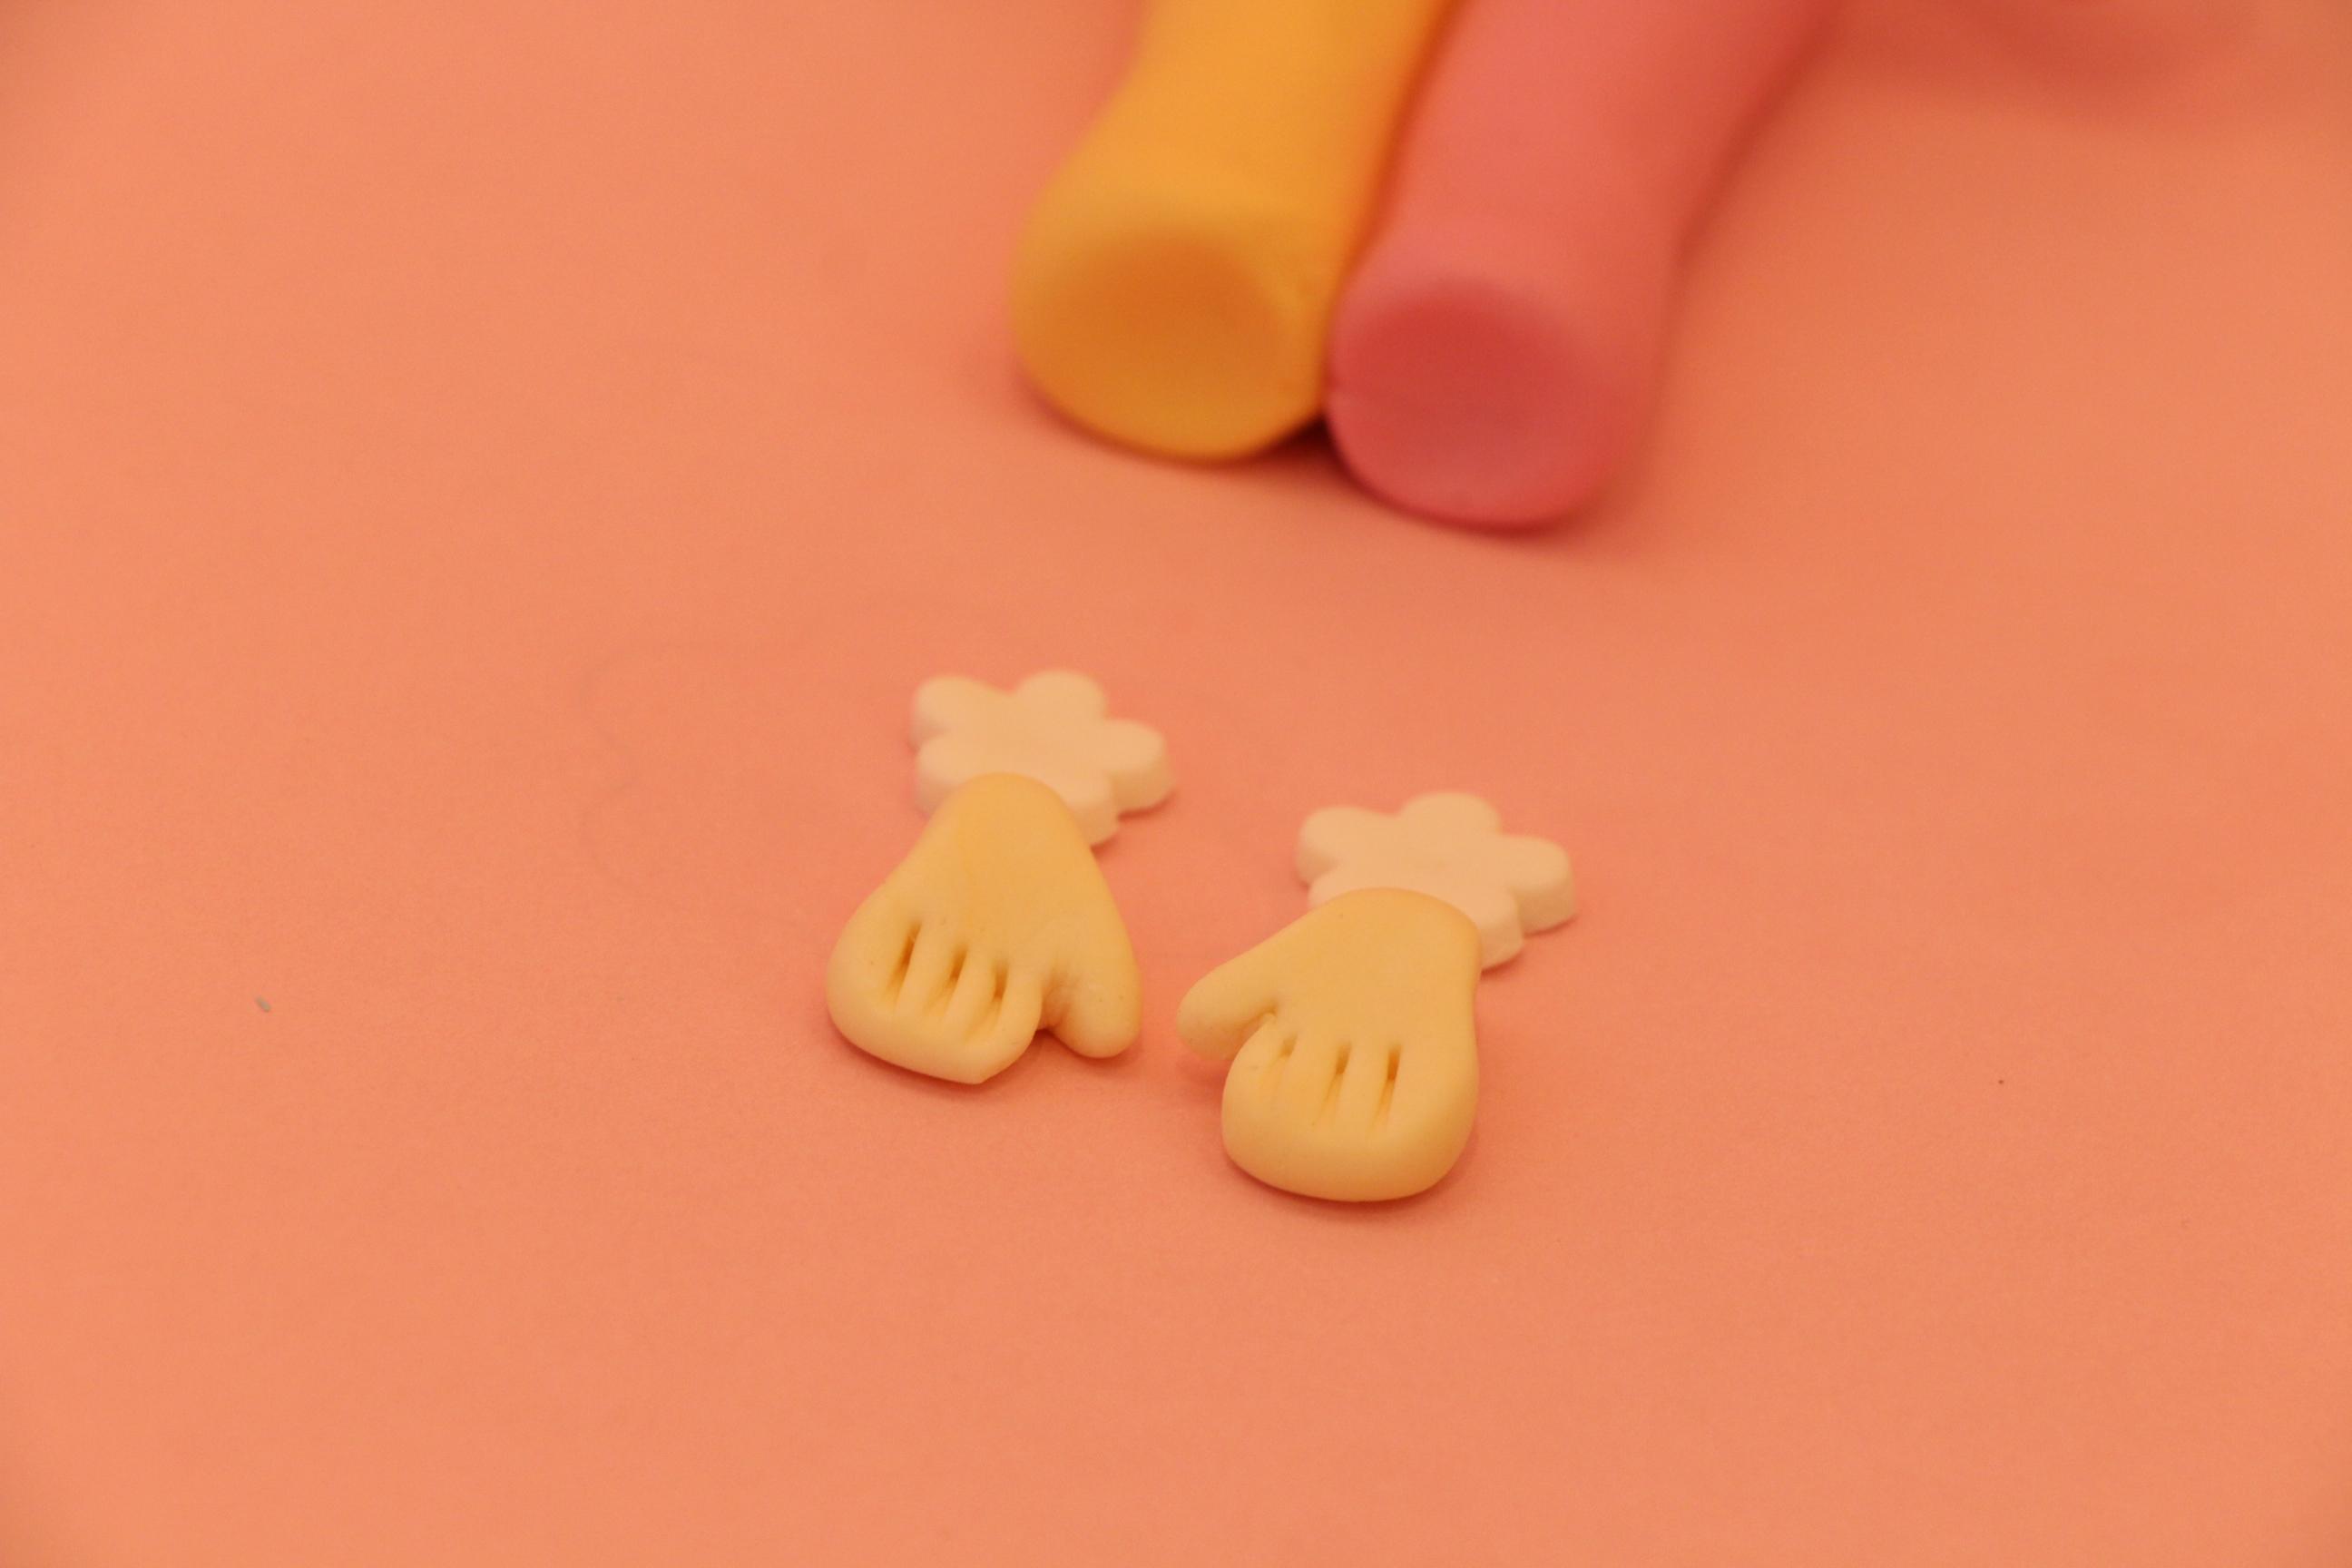 (צילום: עוגאיה) (צילום: עוגאיה)